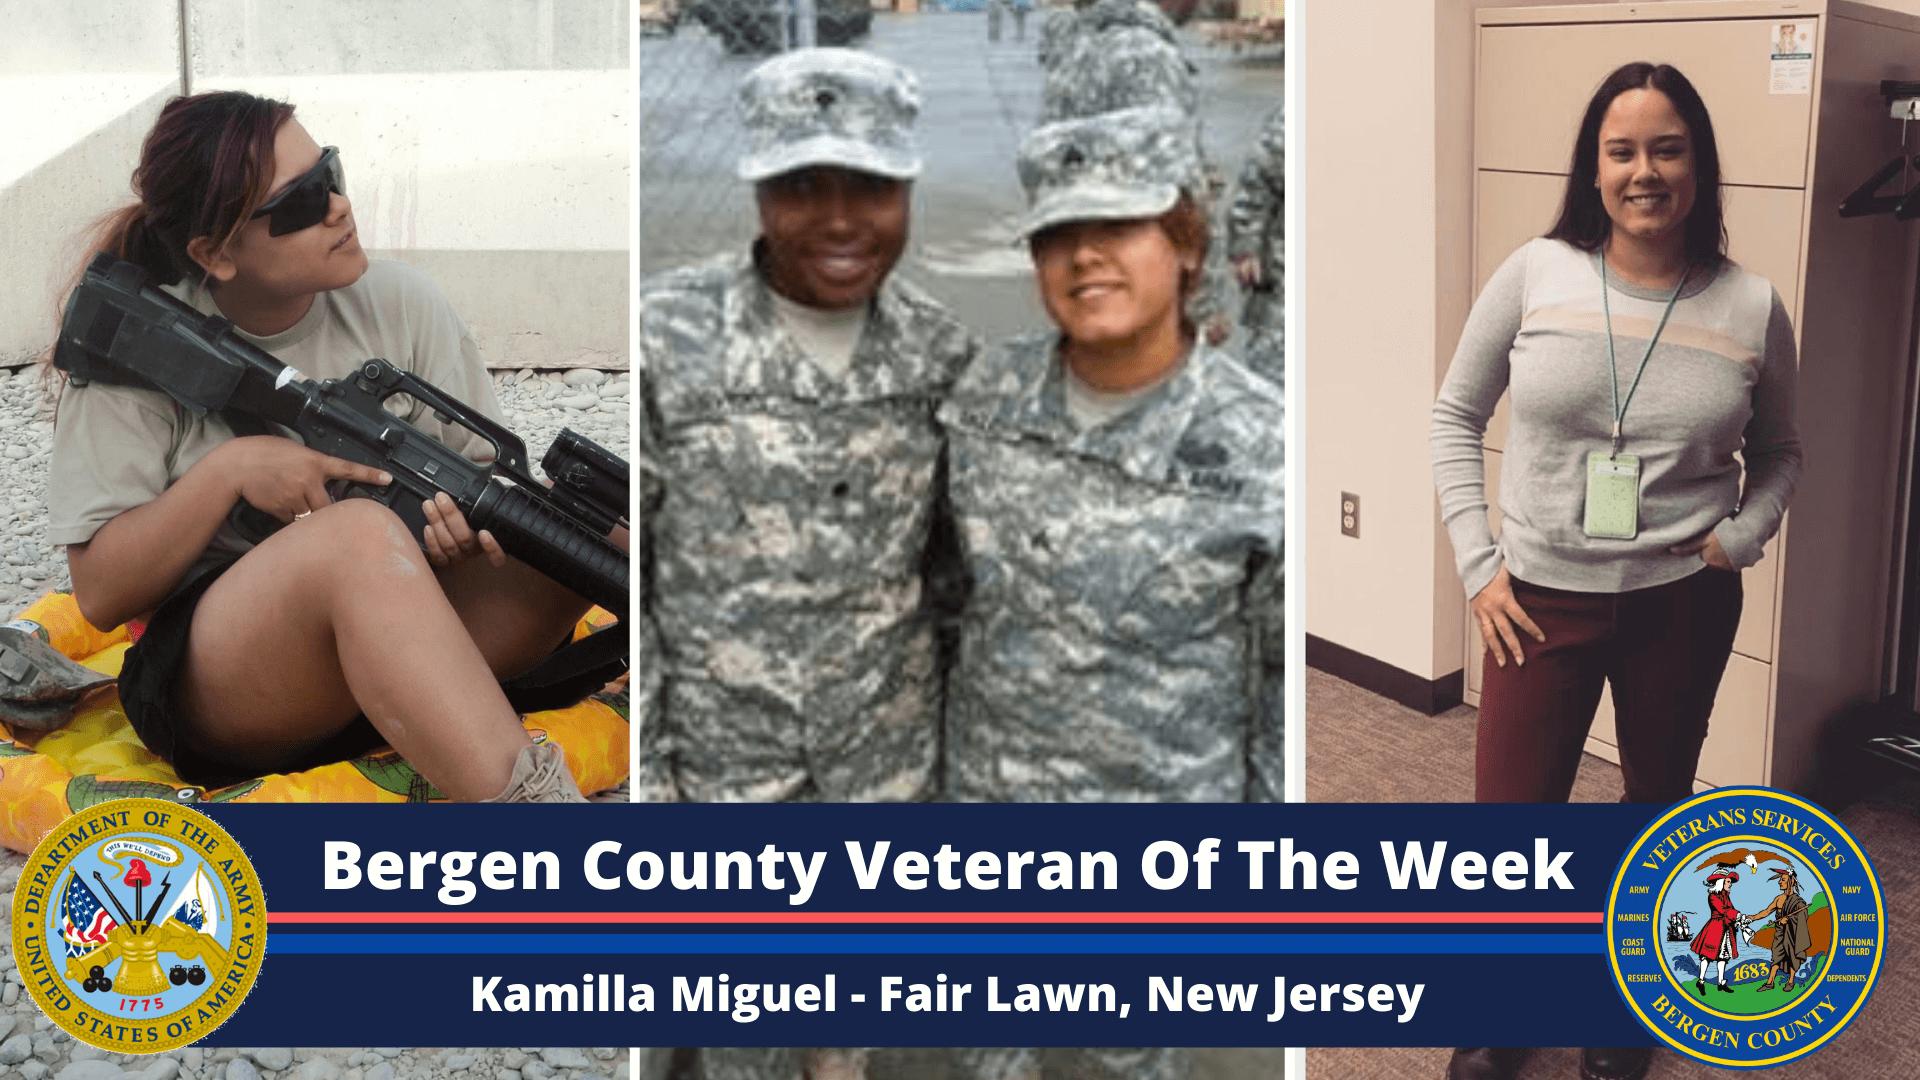 Bergen County Veteran of the Week: Kamilla Miguel